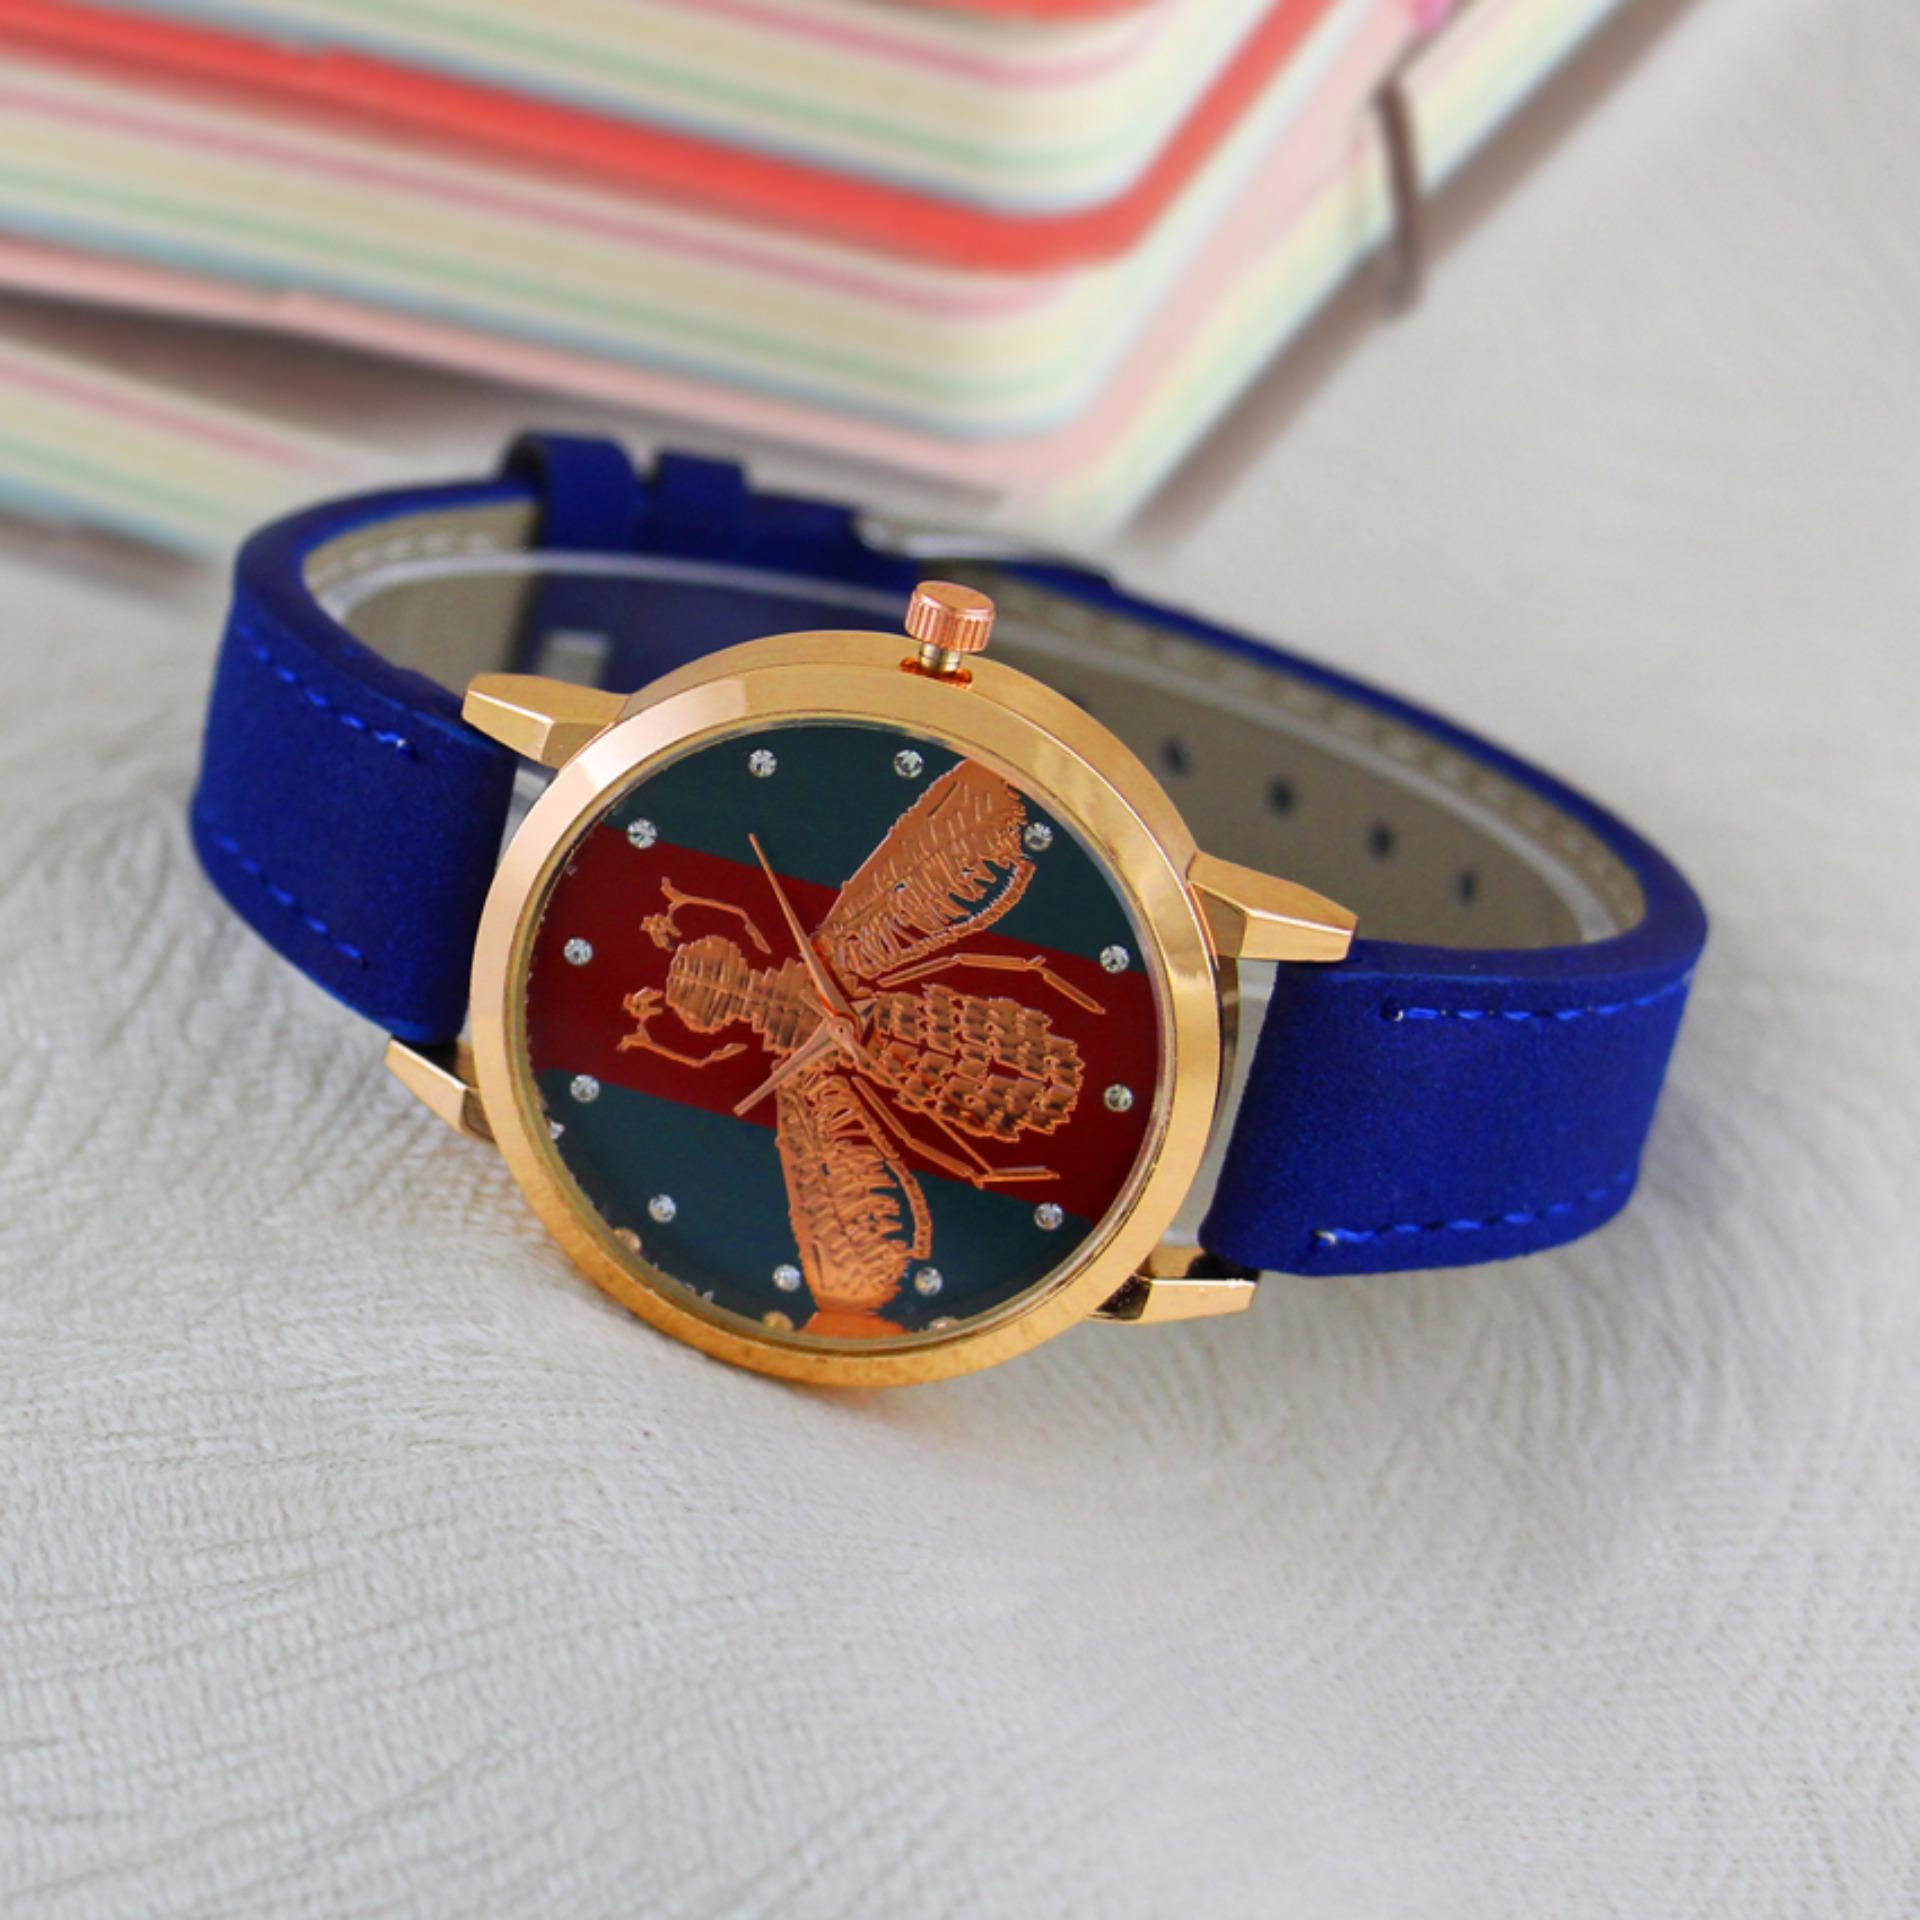 Geneva Cossy Ladies Fashion Watch GNV 1063 Blue - Jam Tangan Wanita - Biru